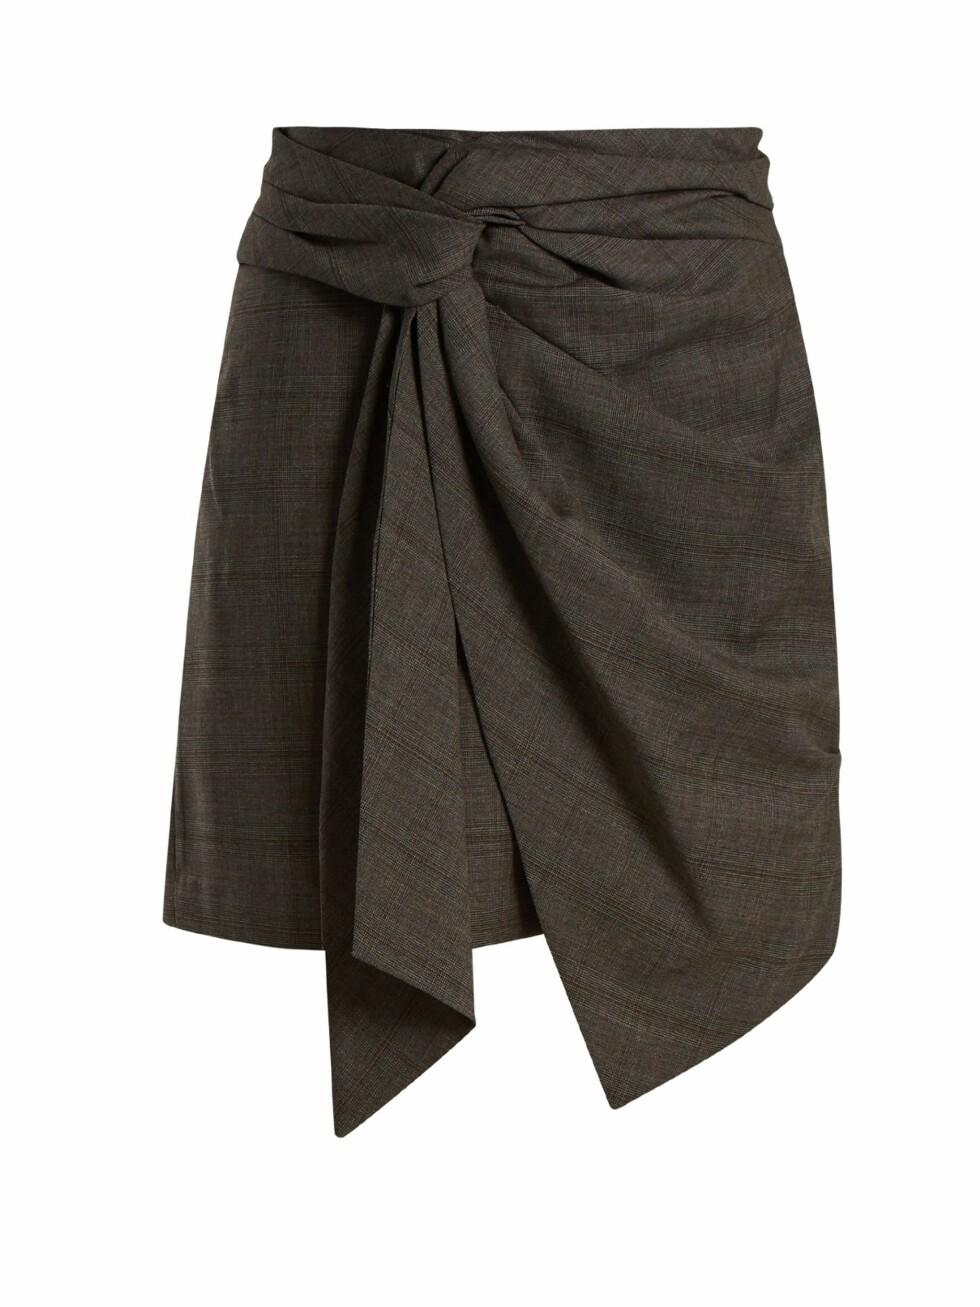 Skjørt fra Isabel Marant via Matchesfashion.com  1945,-  https://www.matchesfashion.com/intl/products/Isabel-Marant-%C3%89toile-Nima-knot-detail-checked-wool-mini-skirt--1165332